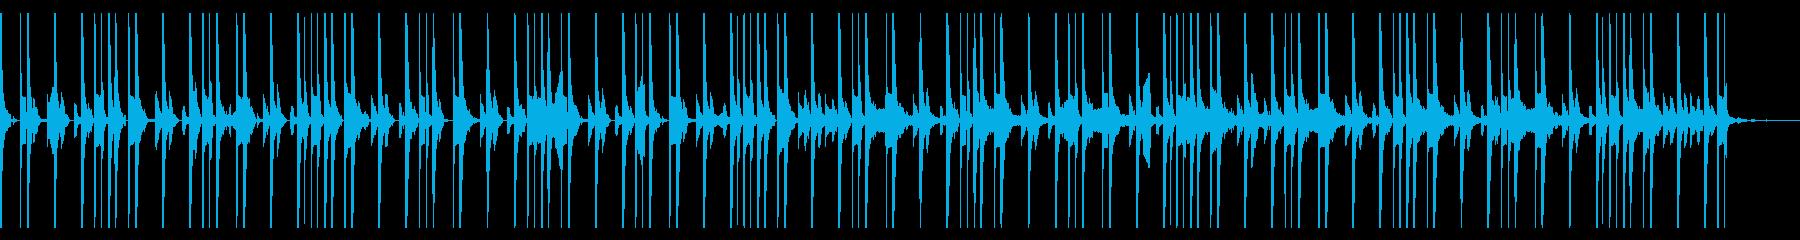 117 BPMの再生済みの波形